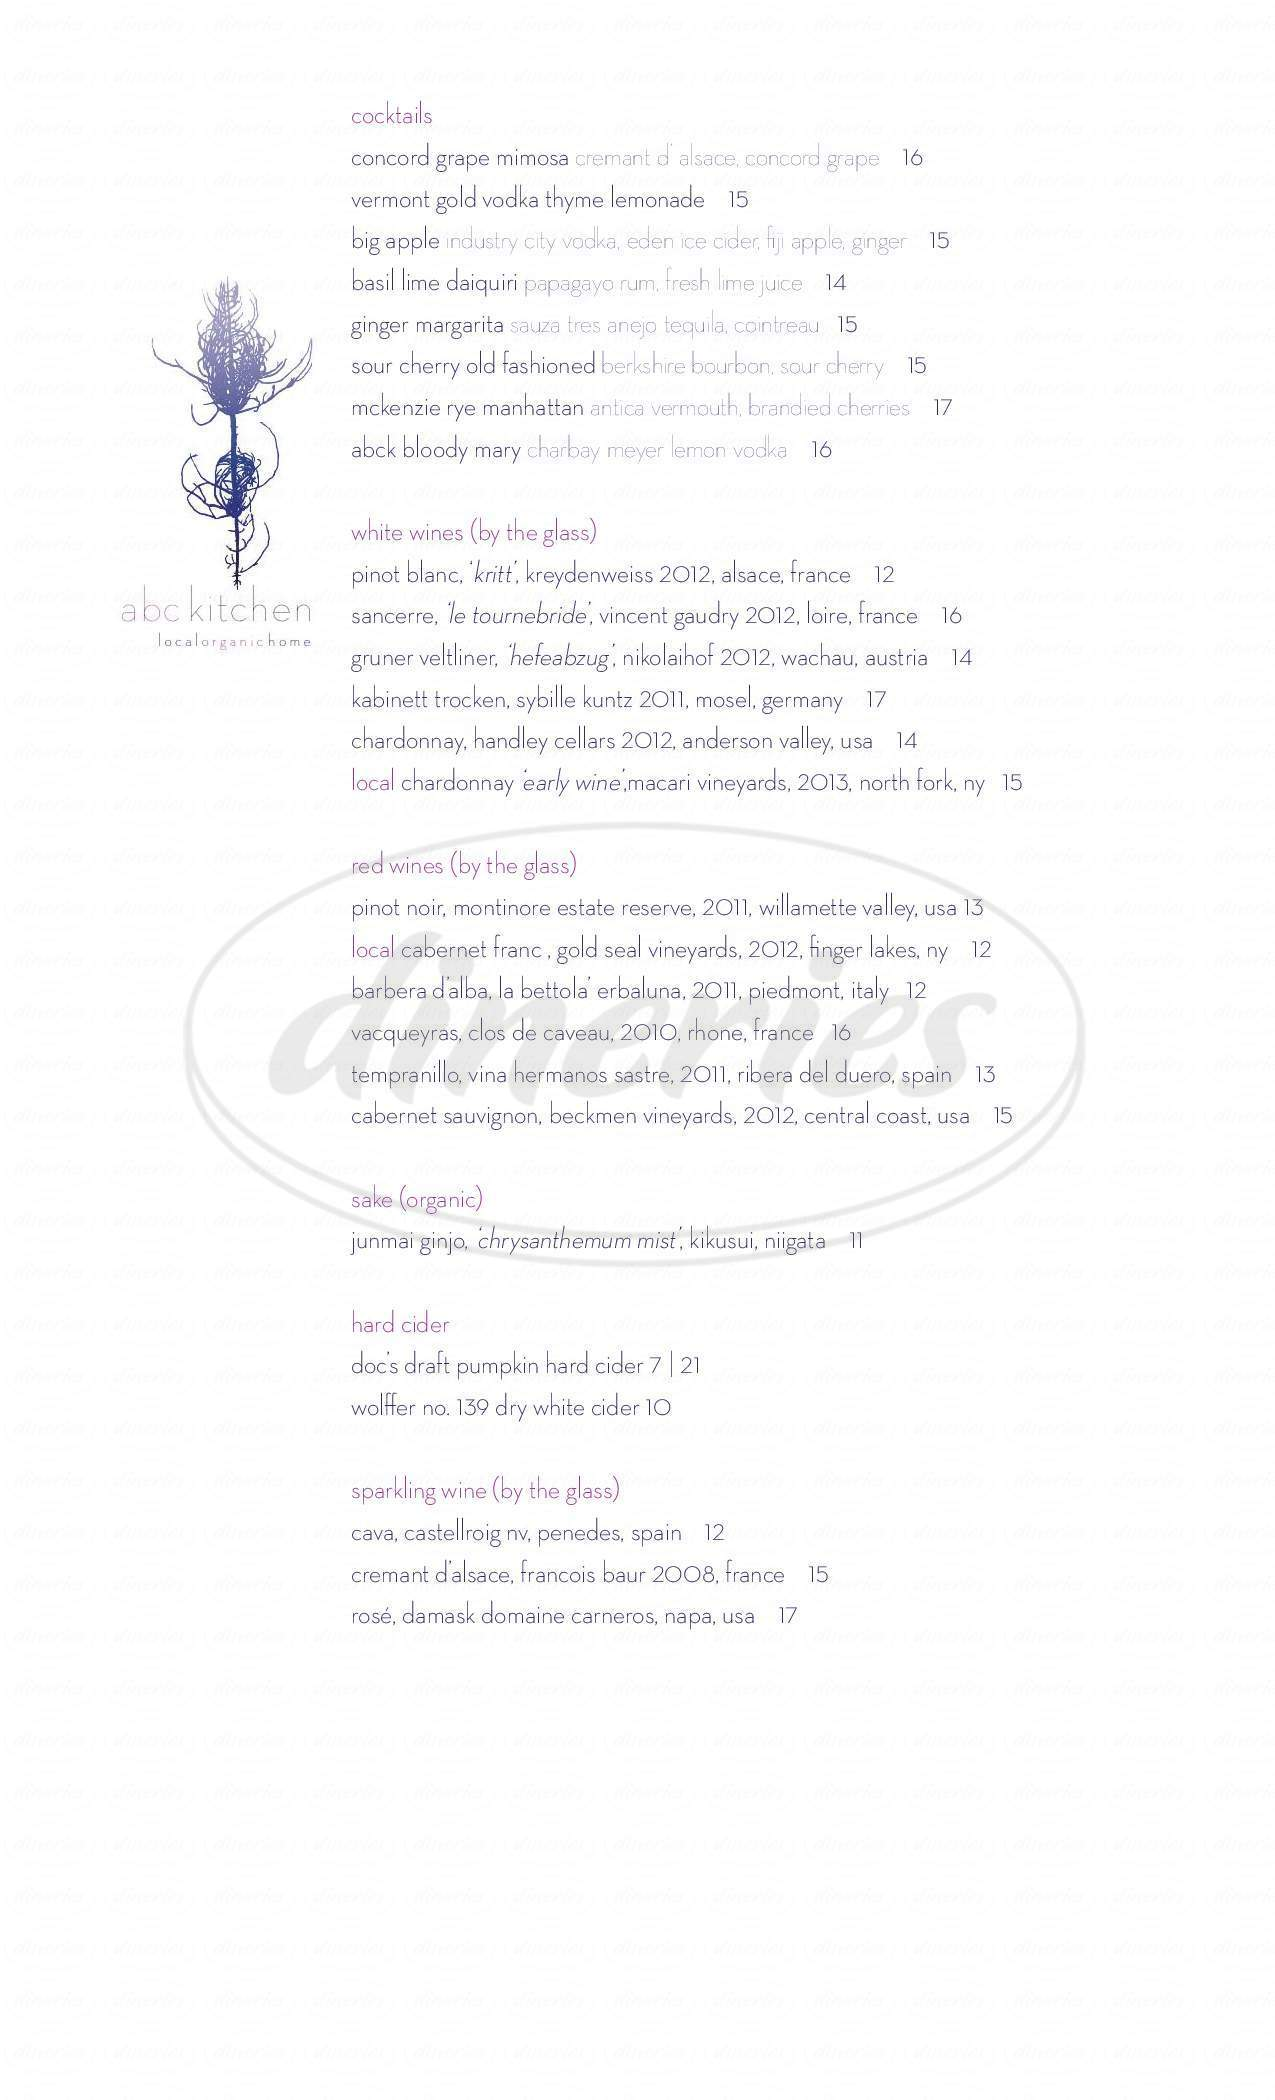 menu for ABC Kitchen